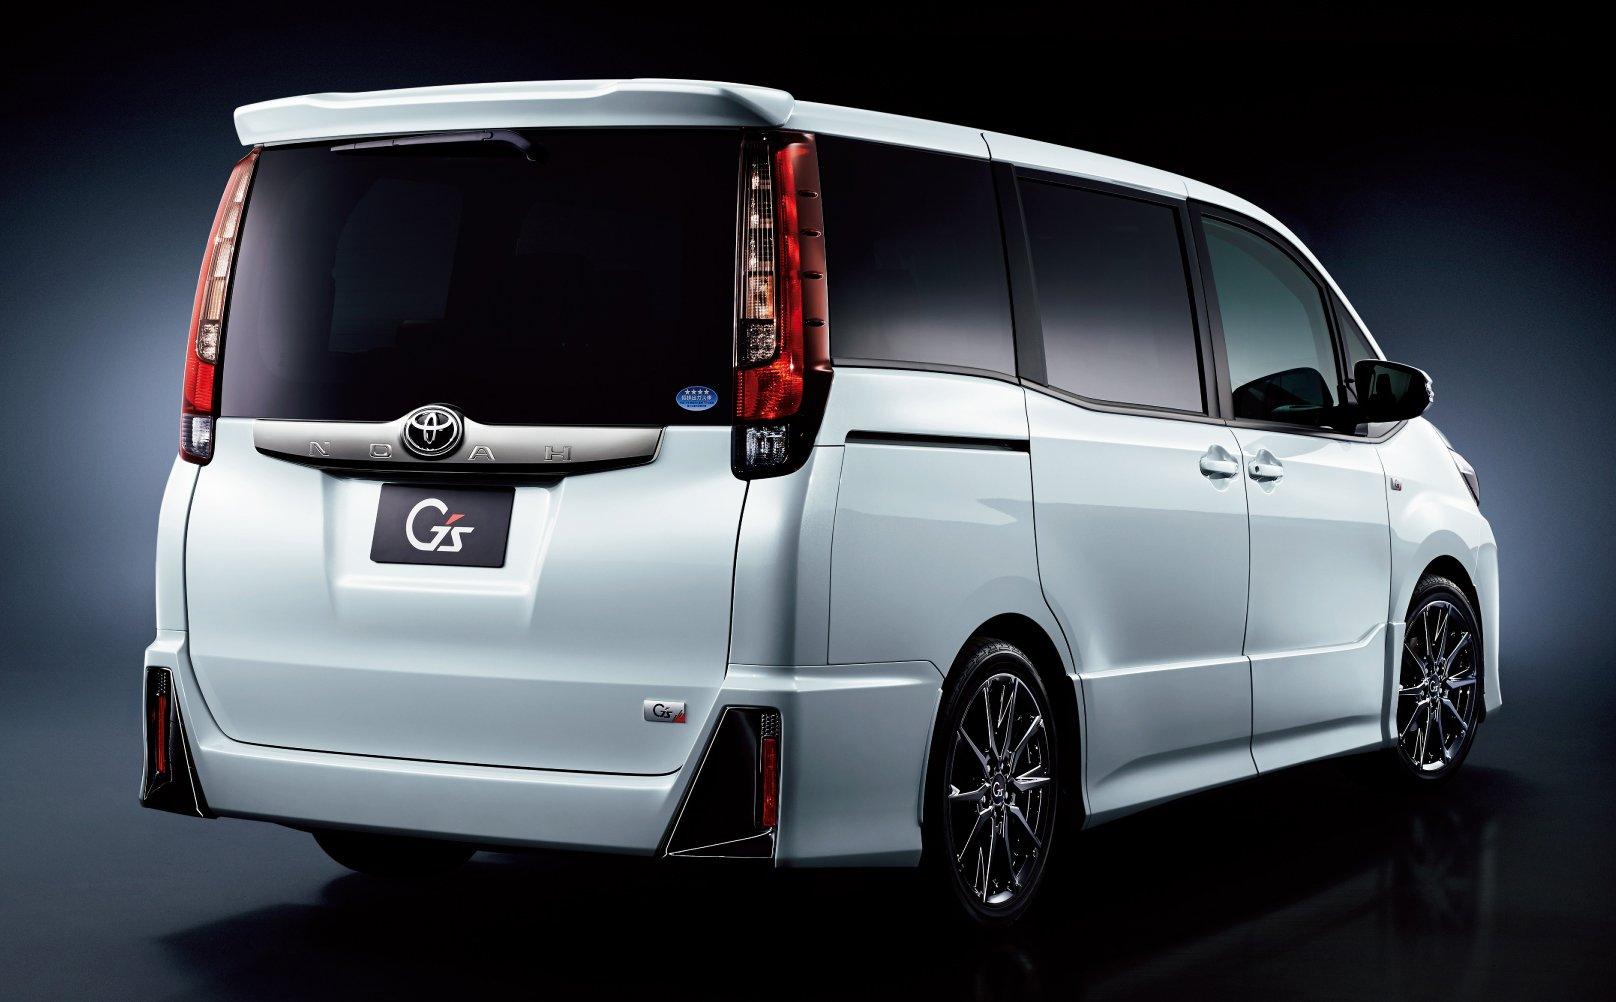 Toyota Noah and Voxy get Gazoo Racing G's treatment Image ...